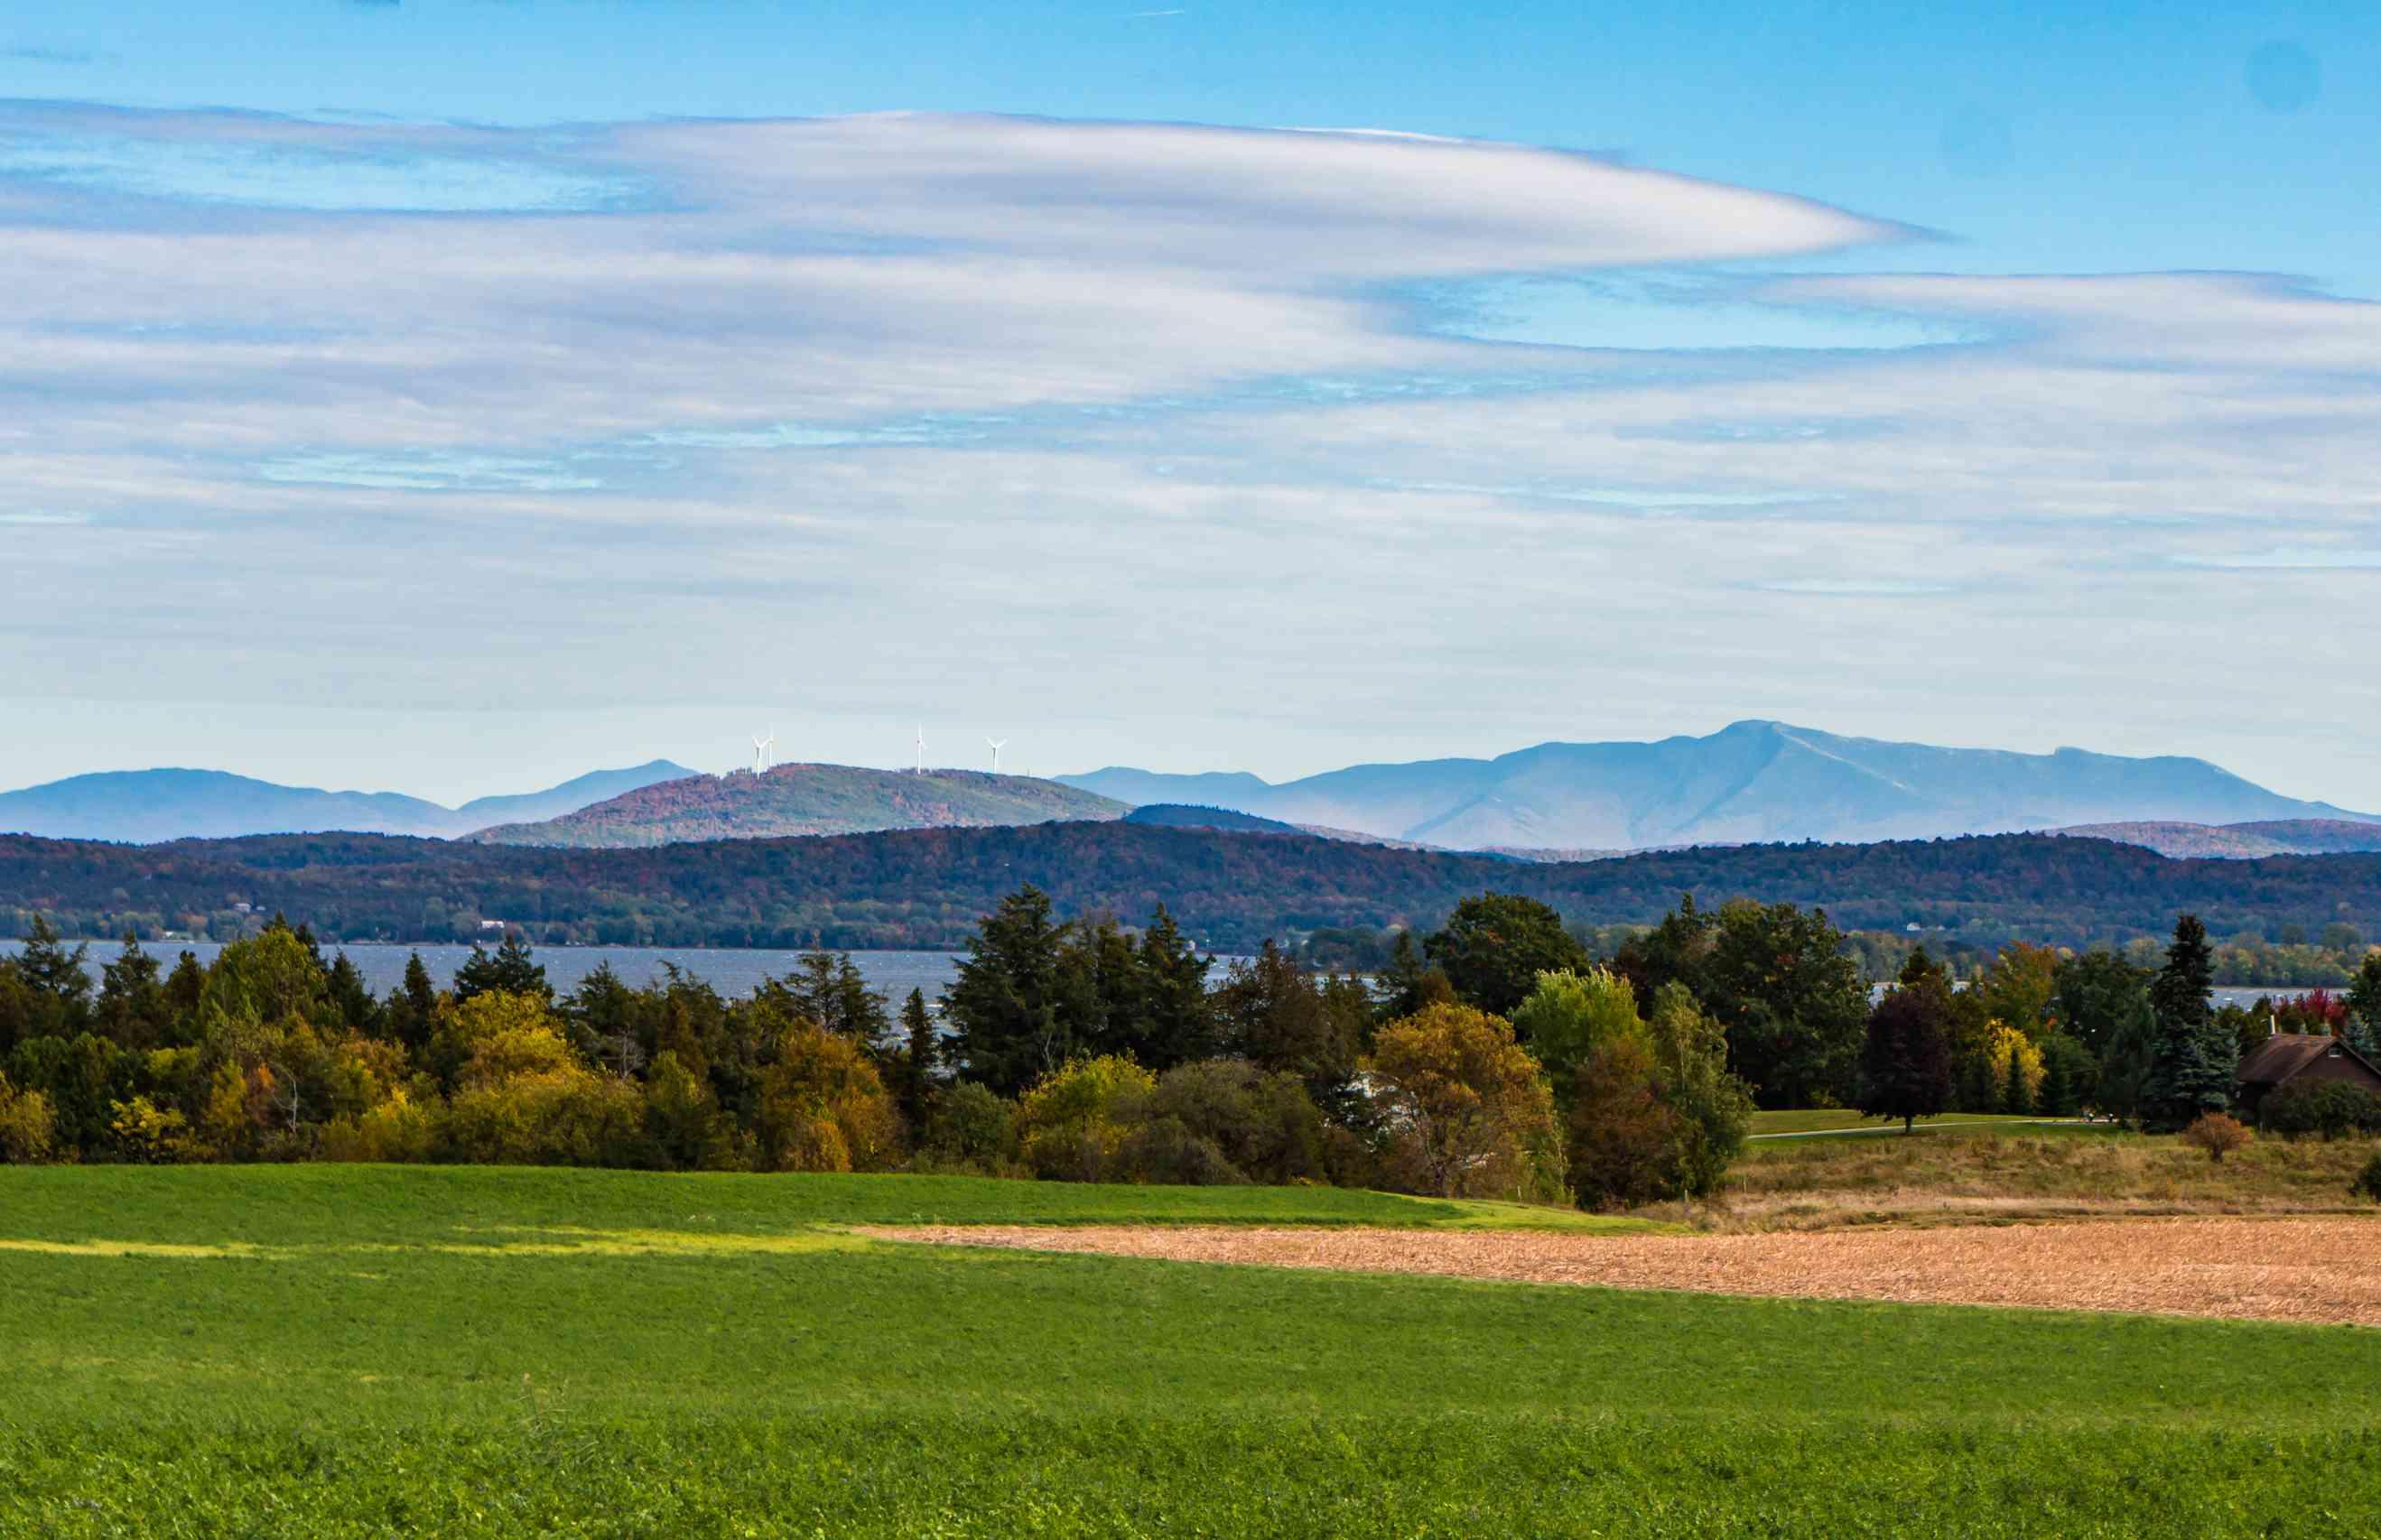 Grand Isle in Lake Champlain, Vermont